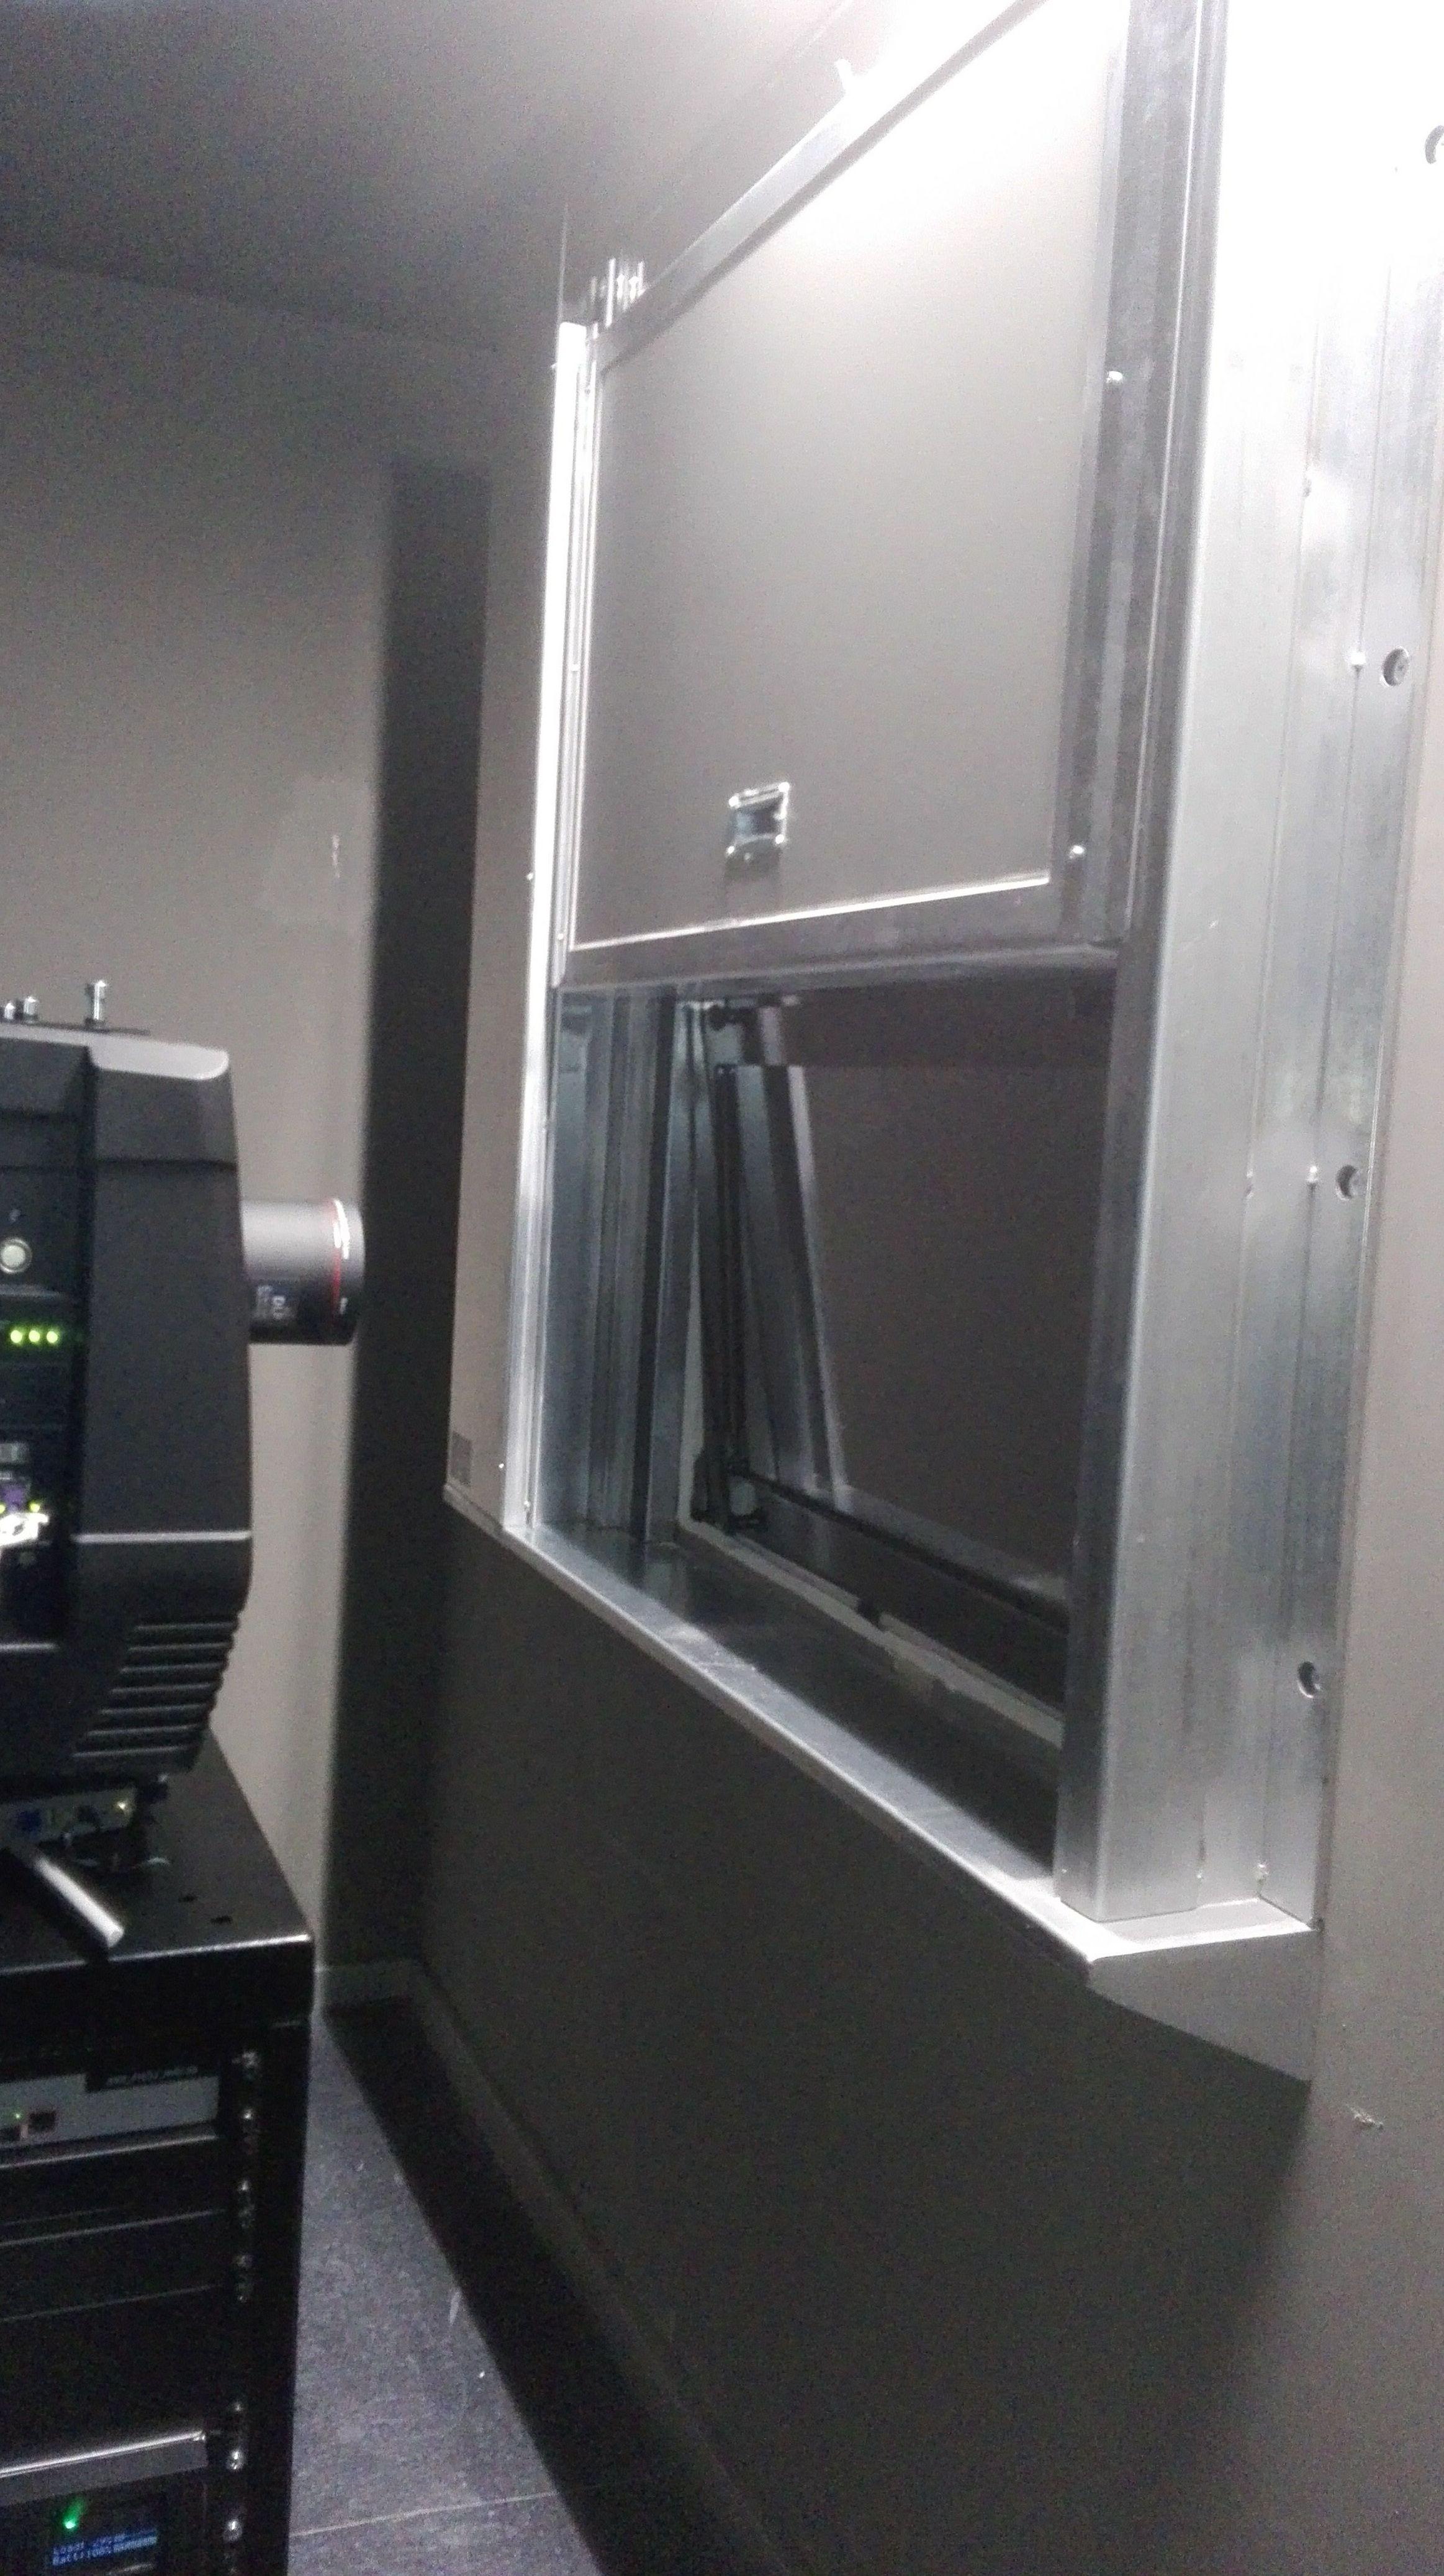 Puerta guillotina en Ventana cortafuegos sala de cine, sujeción a tabique de yeso